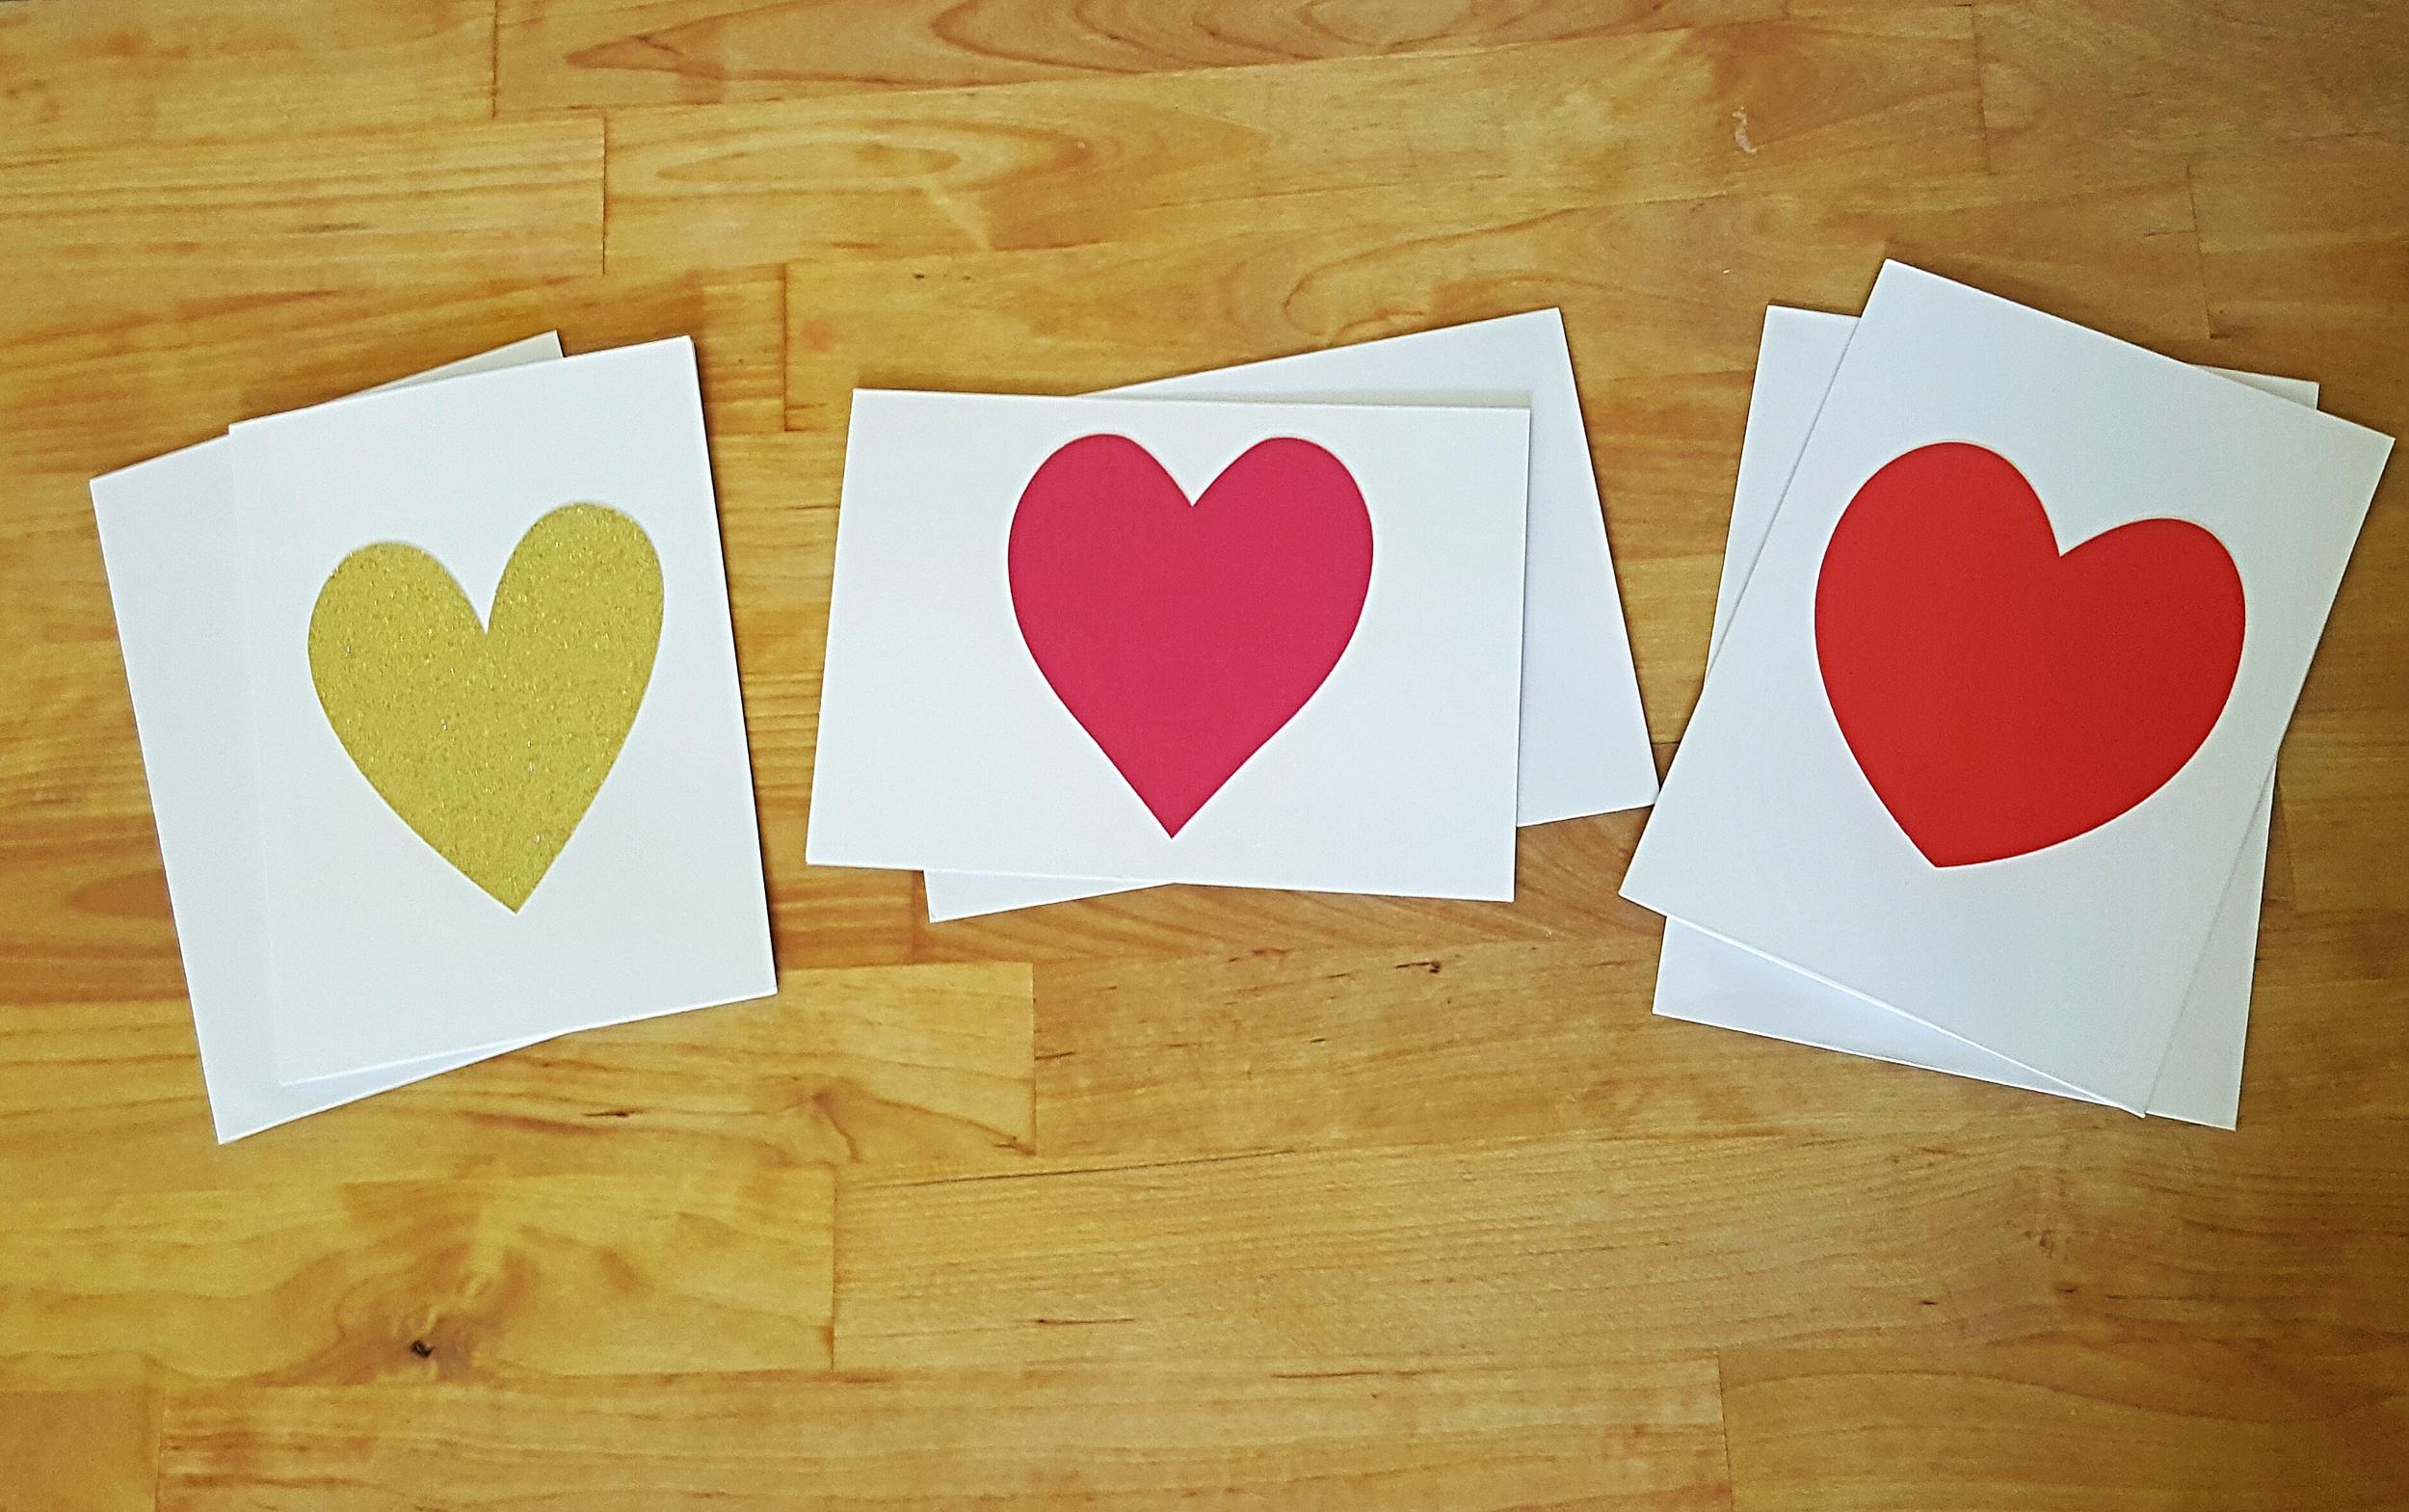 Thrifty-heart-cards.jpg